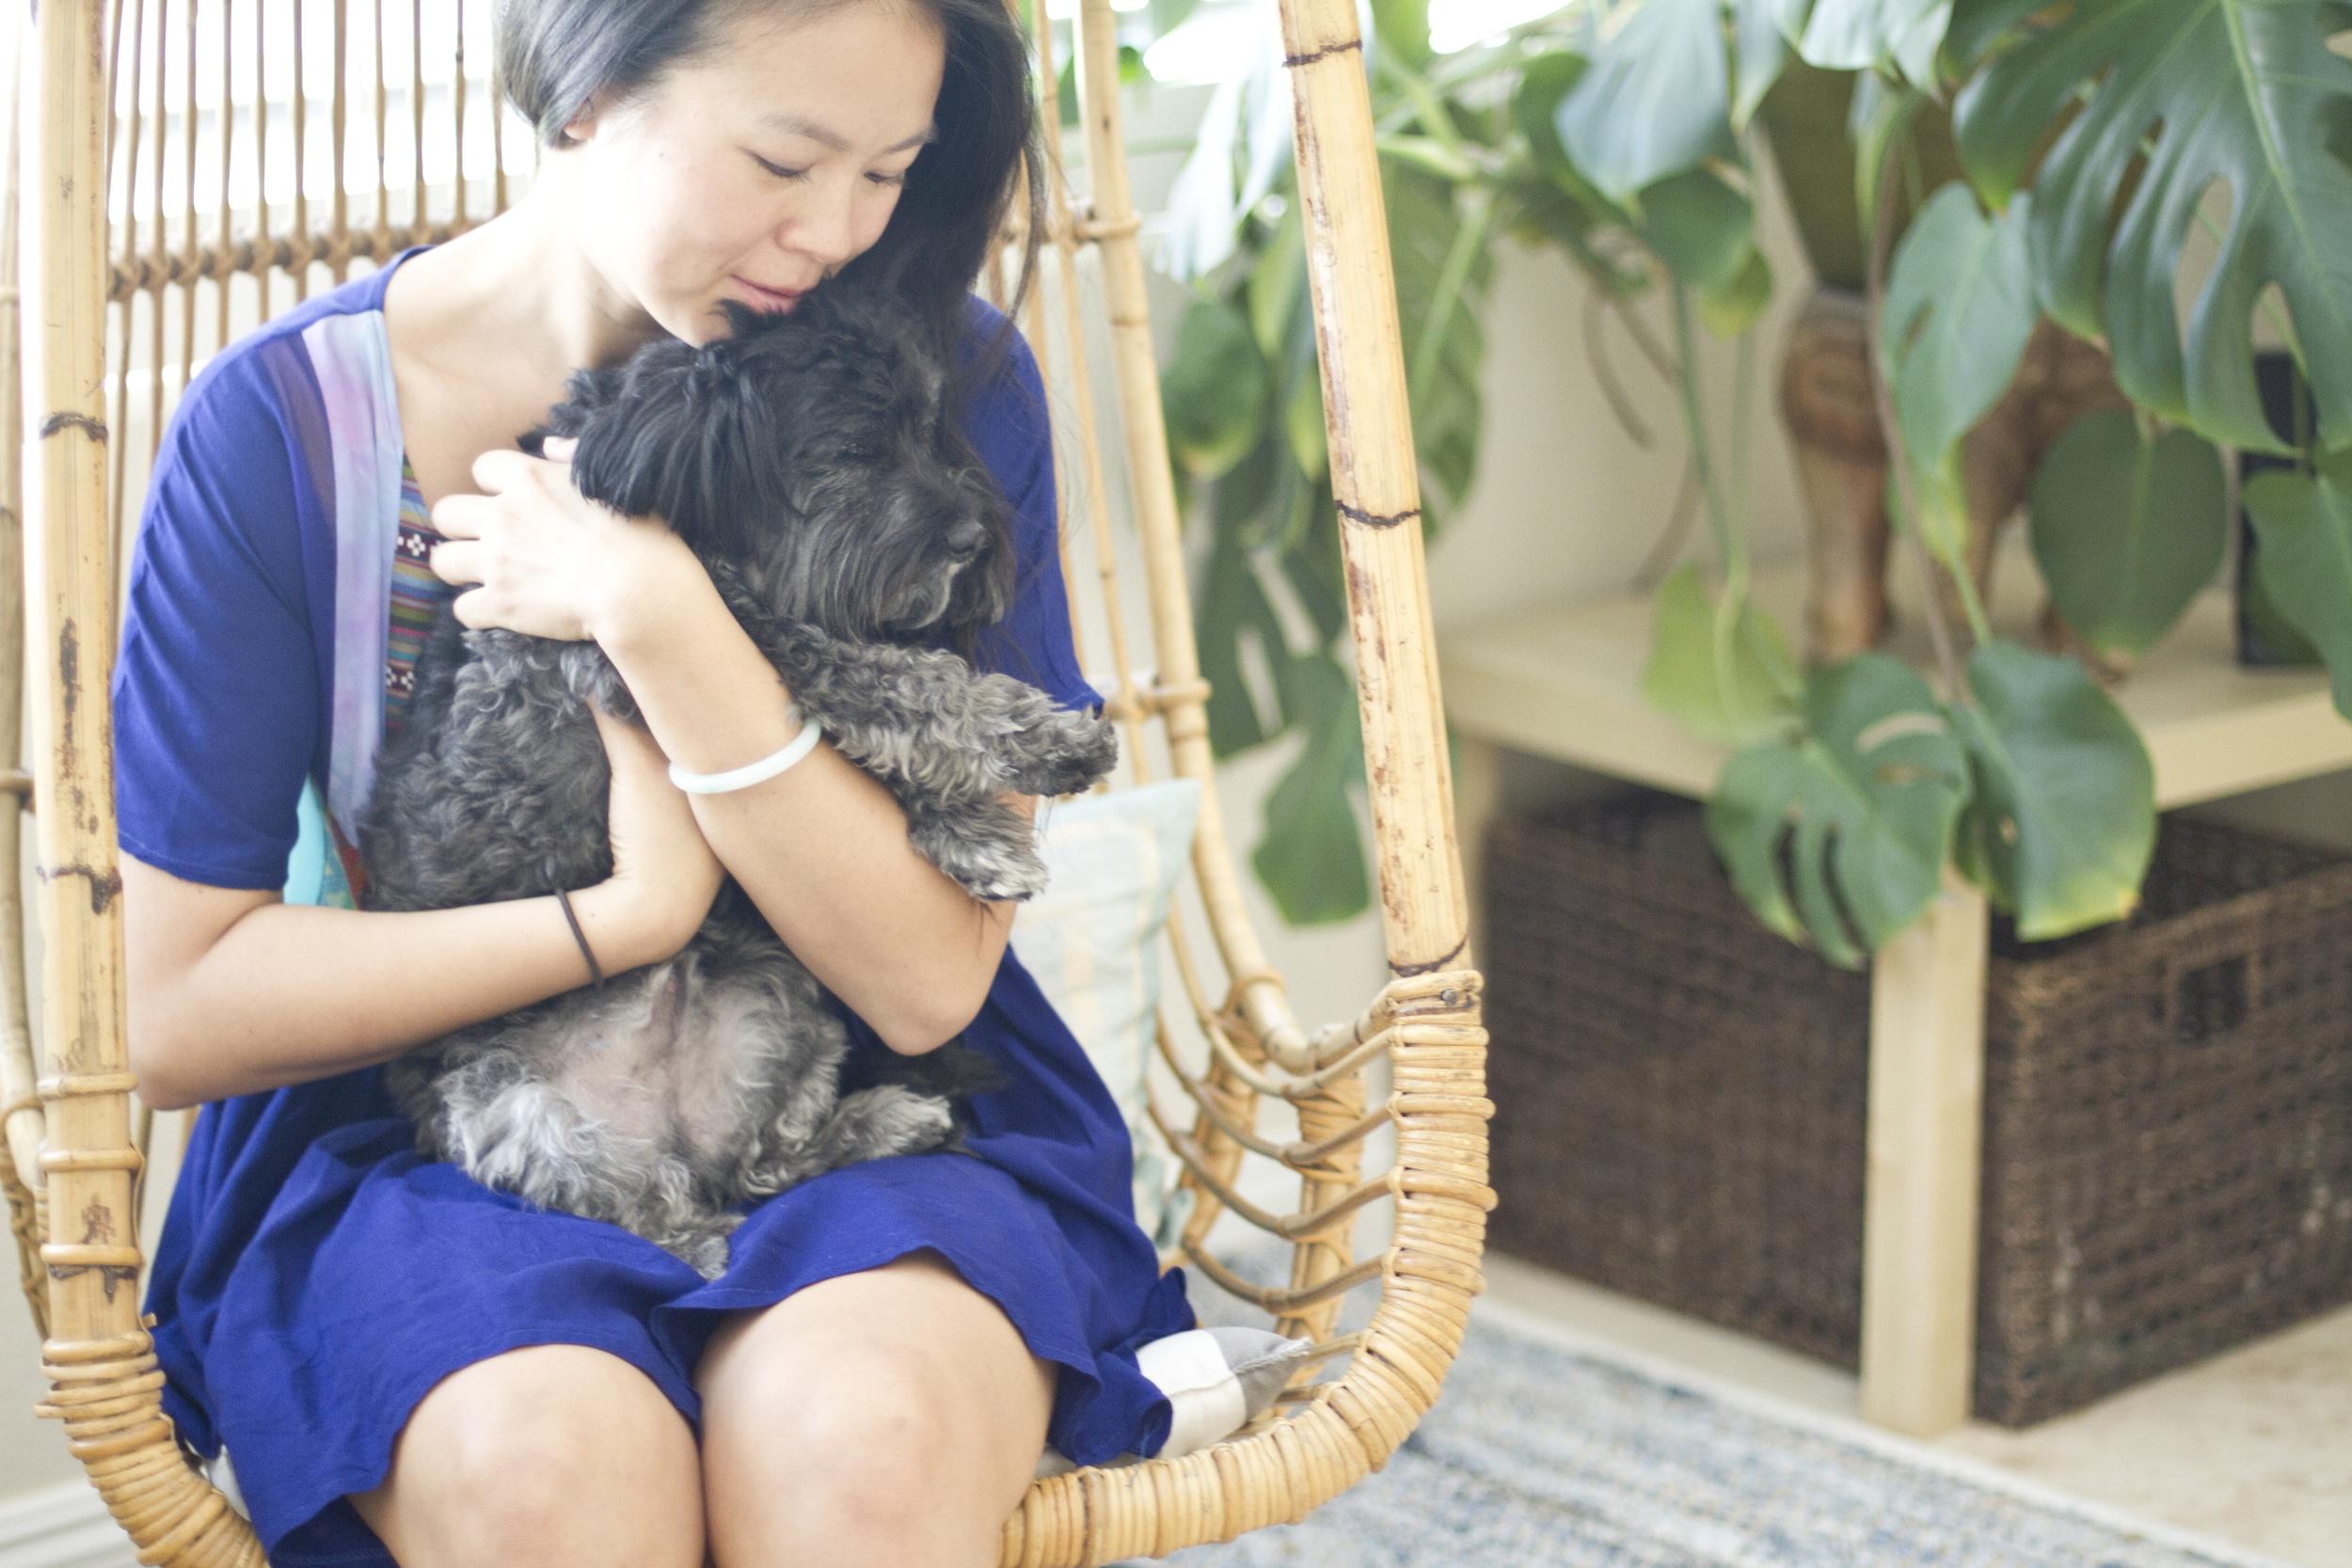 Lianna cuddling with Schatzi.